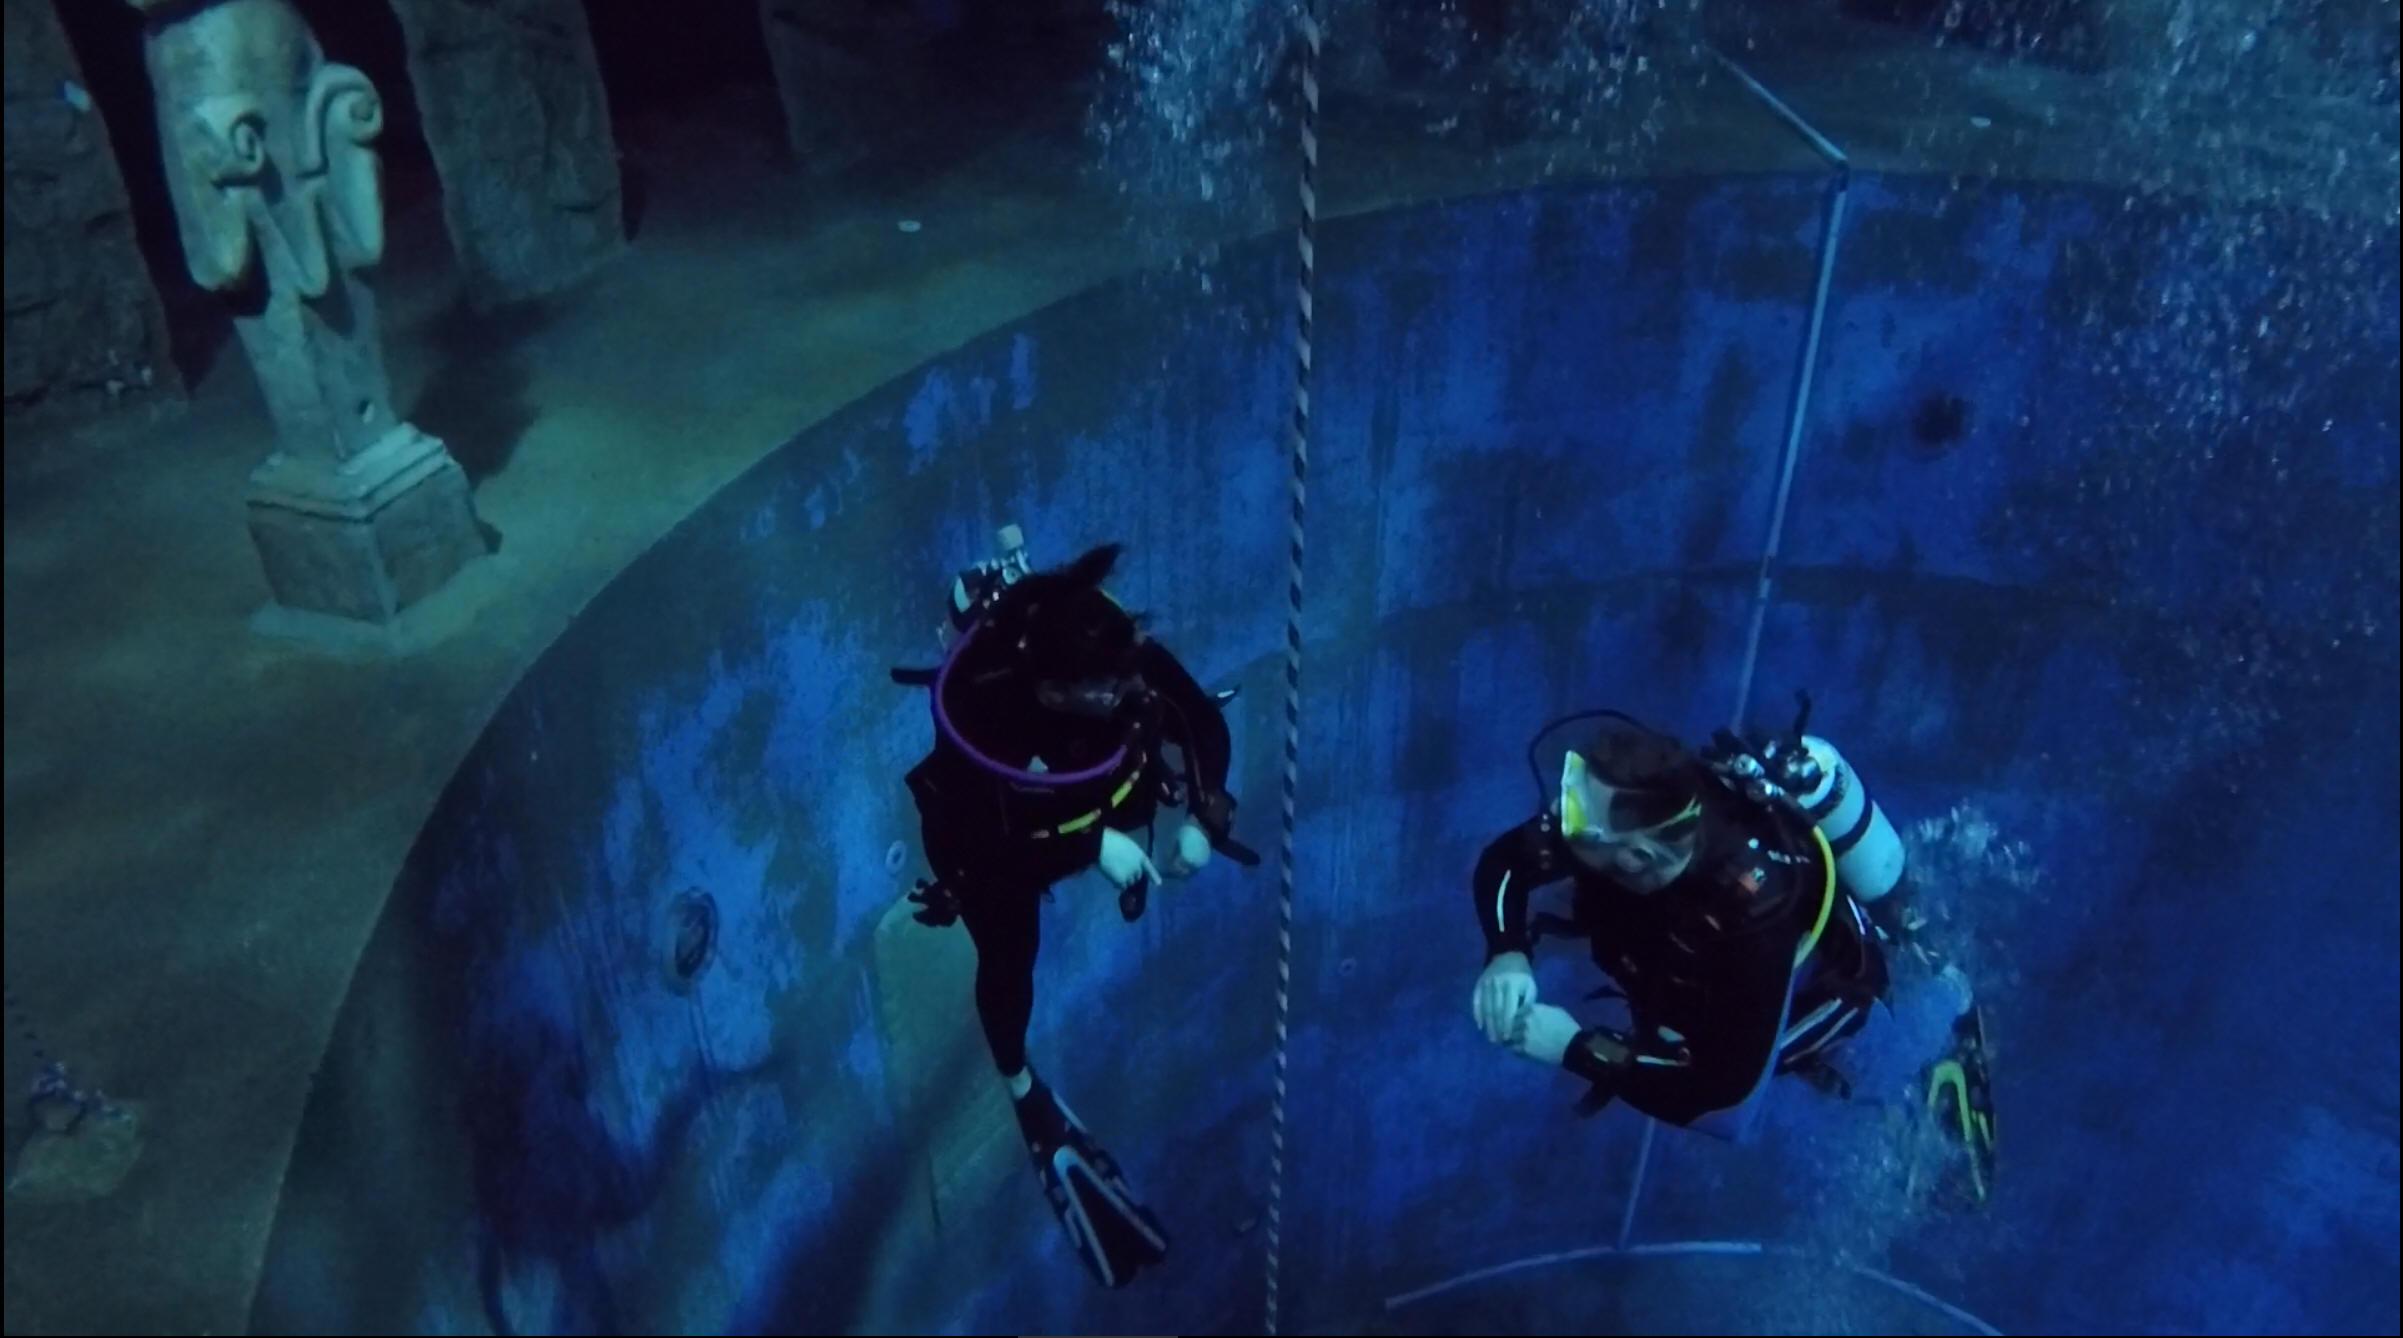 201801_CPS_Sortie Fosse Dive4Life_020